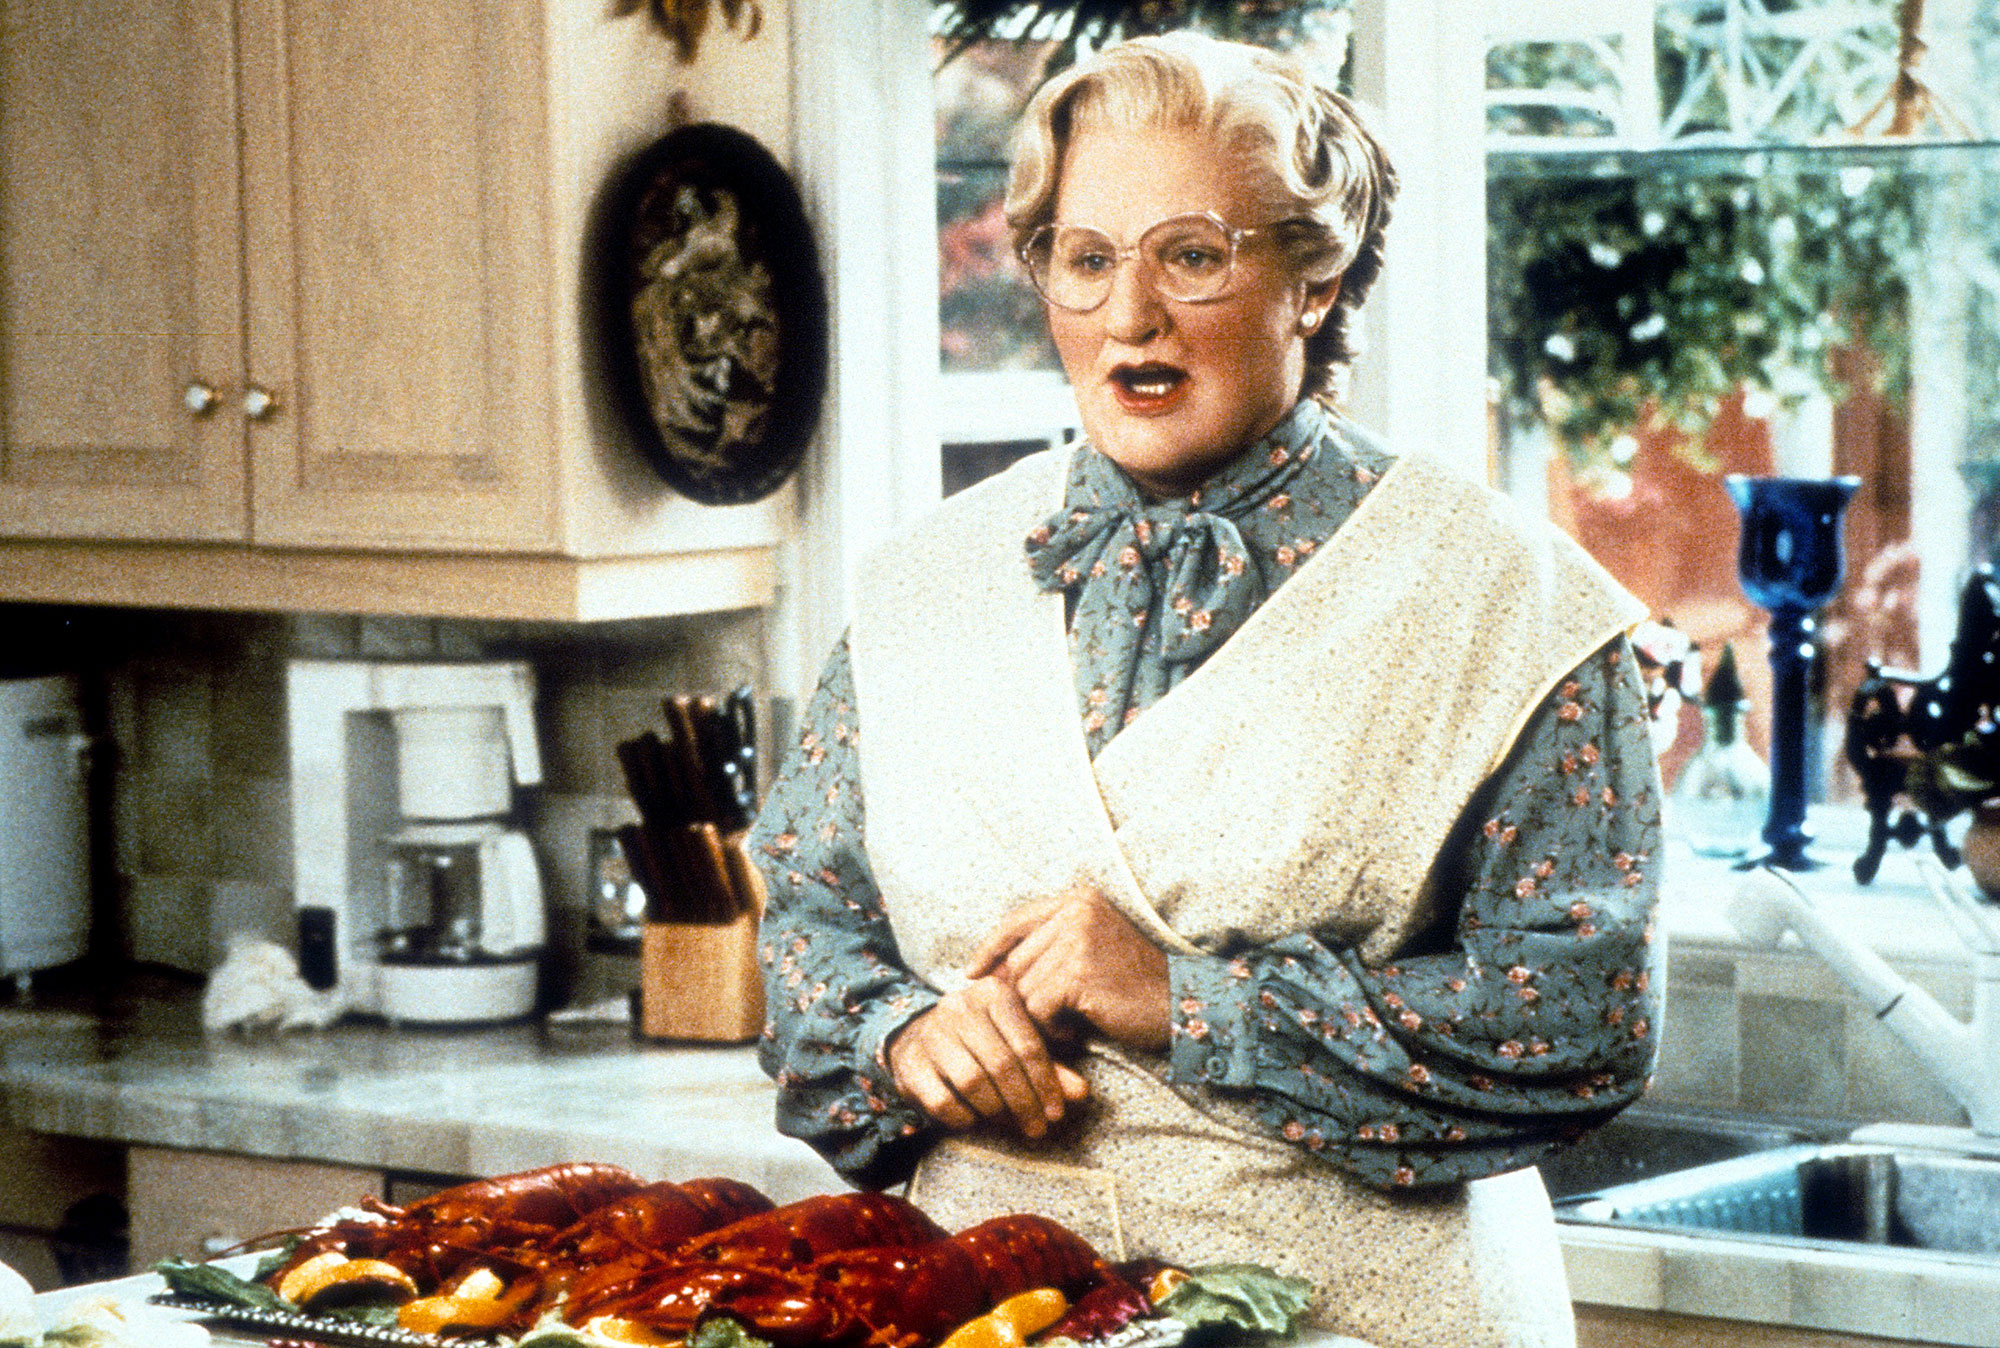 Robin Williams in Mrs Doubtfire Sarah Michelle Gellar Introduces Her Kids to Mrs Doubtfire on Robin Williams 68th Birthday